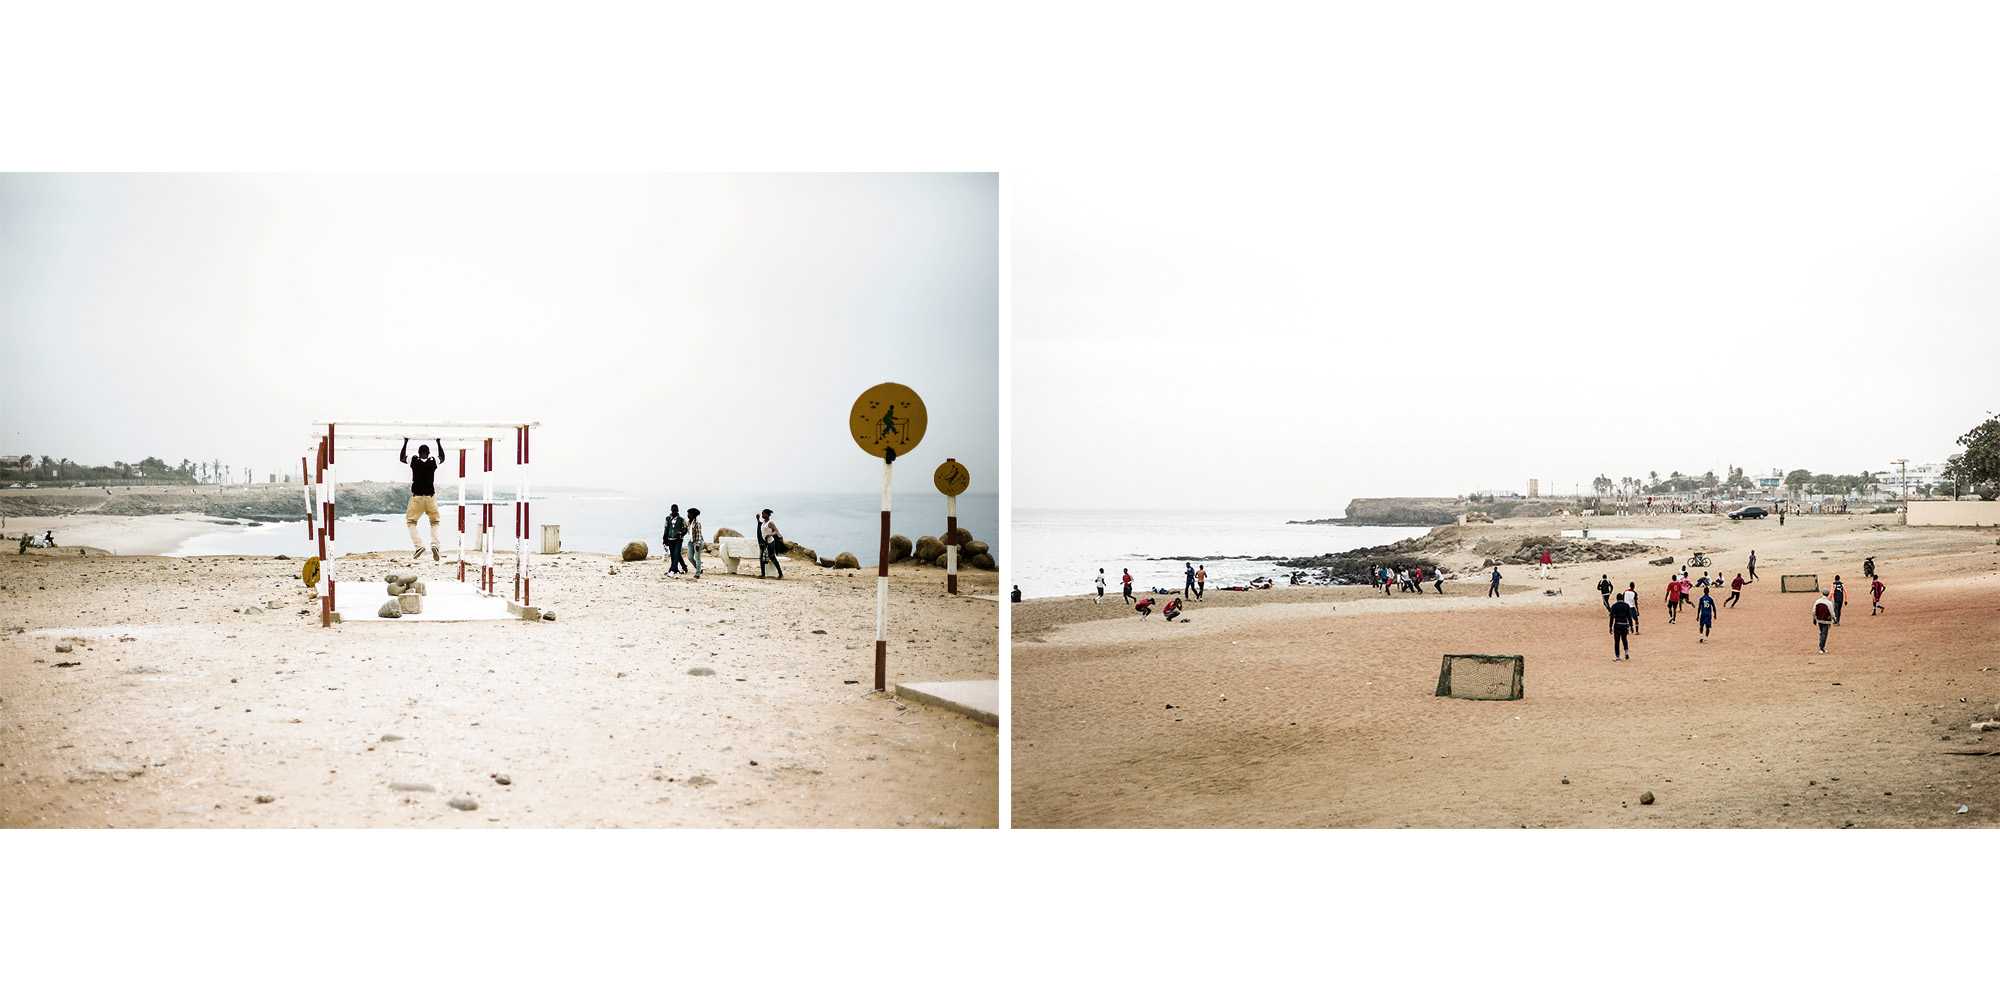 Cour de Cassation Beach, Senegal (Series) / Personal Work